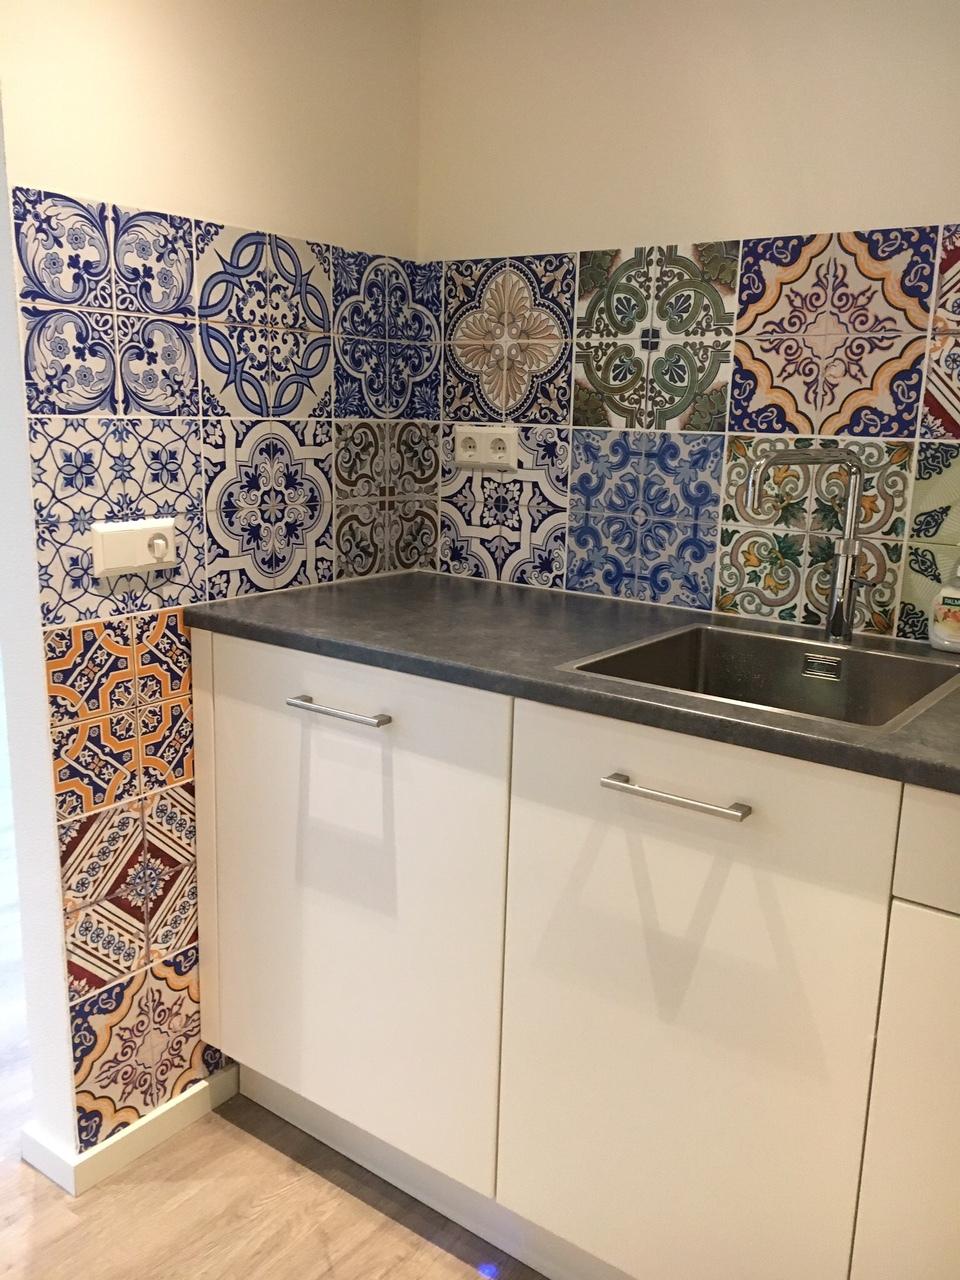 kitchenwalls backsplash wallpaper portugal